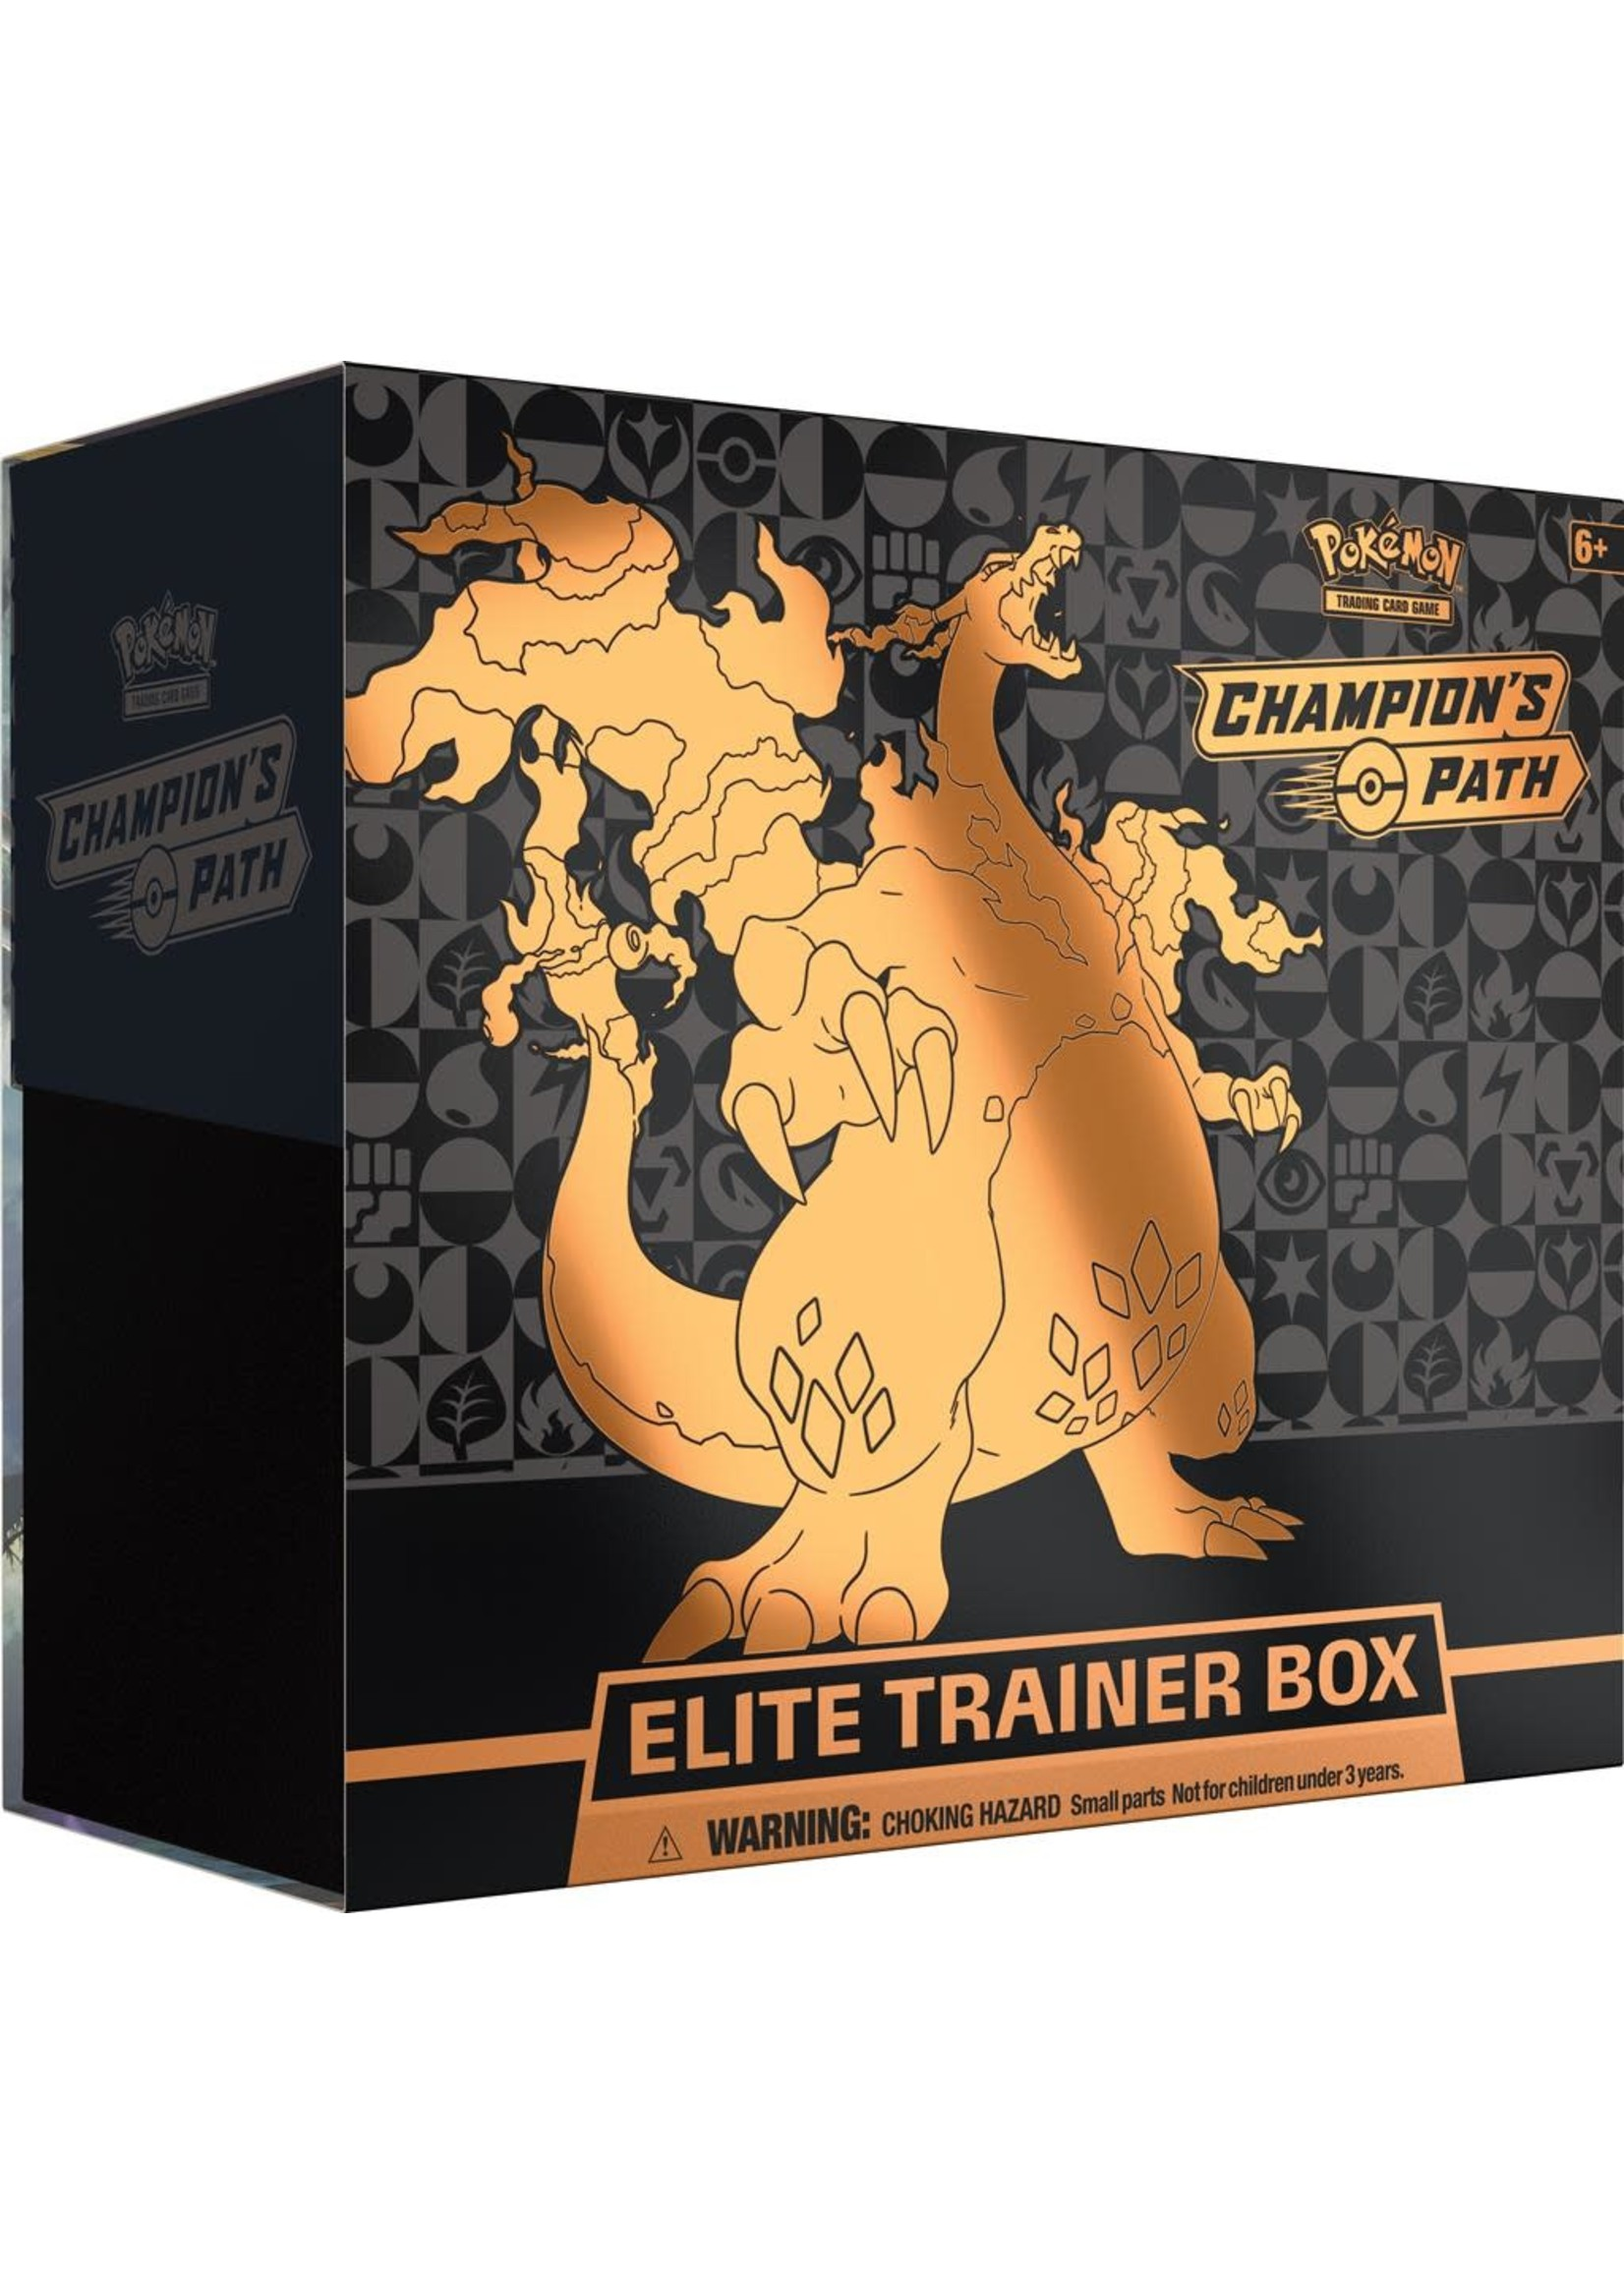 POK TCG Champion's Path Elite Trainer Box